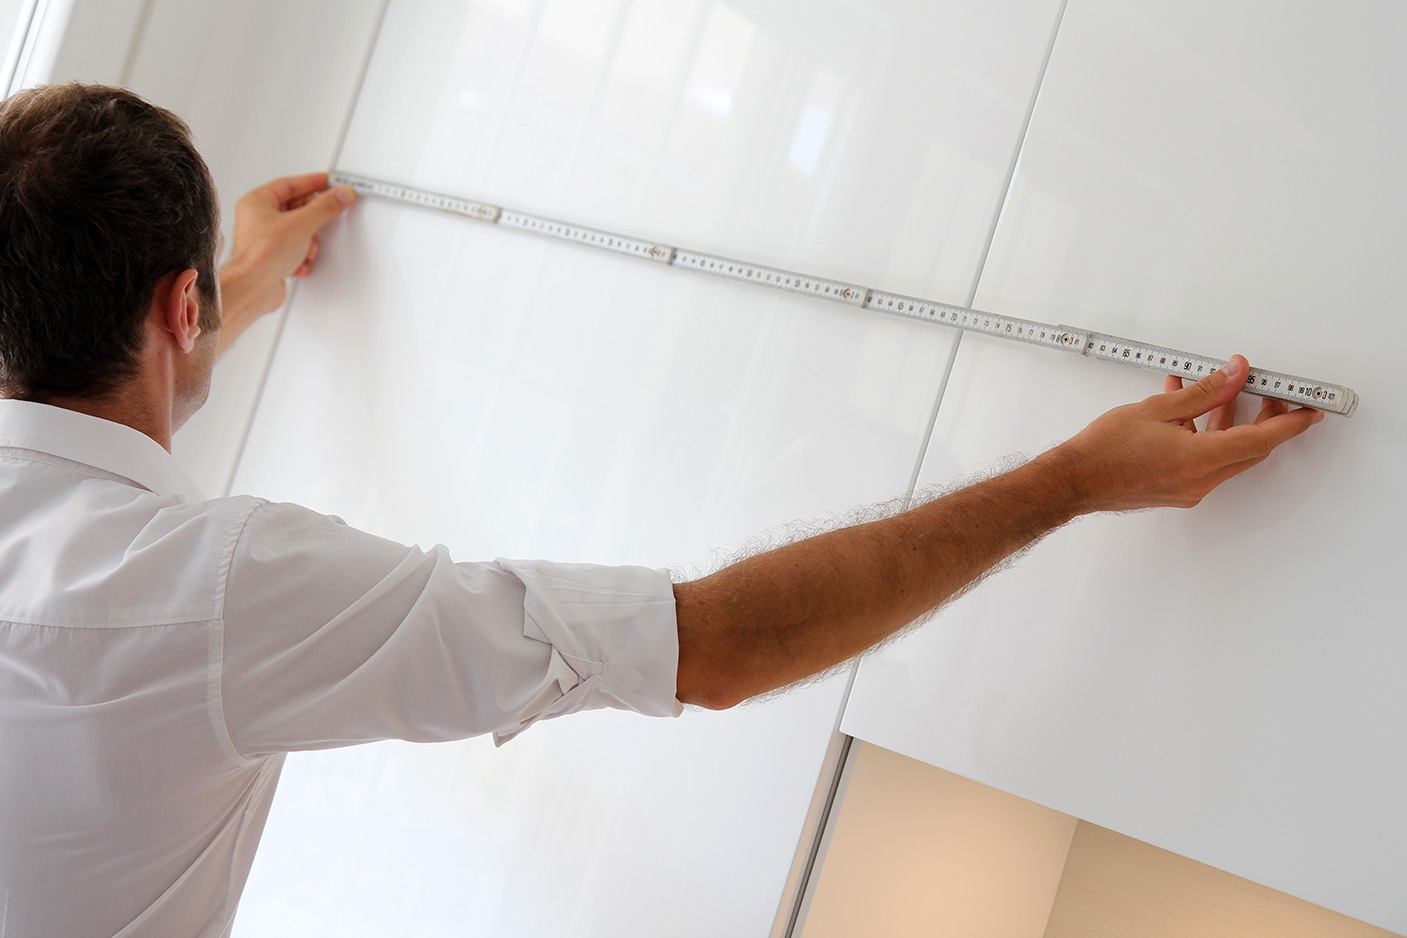 man taking measurements for kitchen remodel